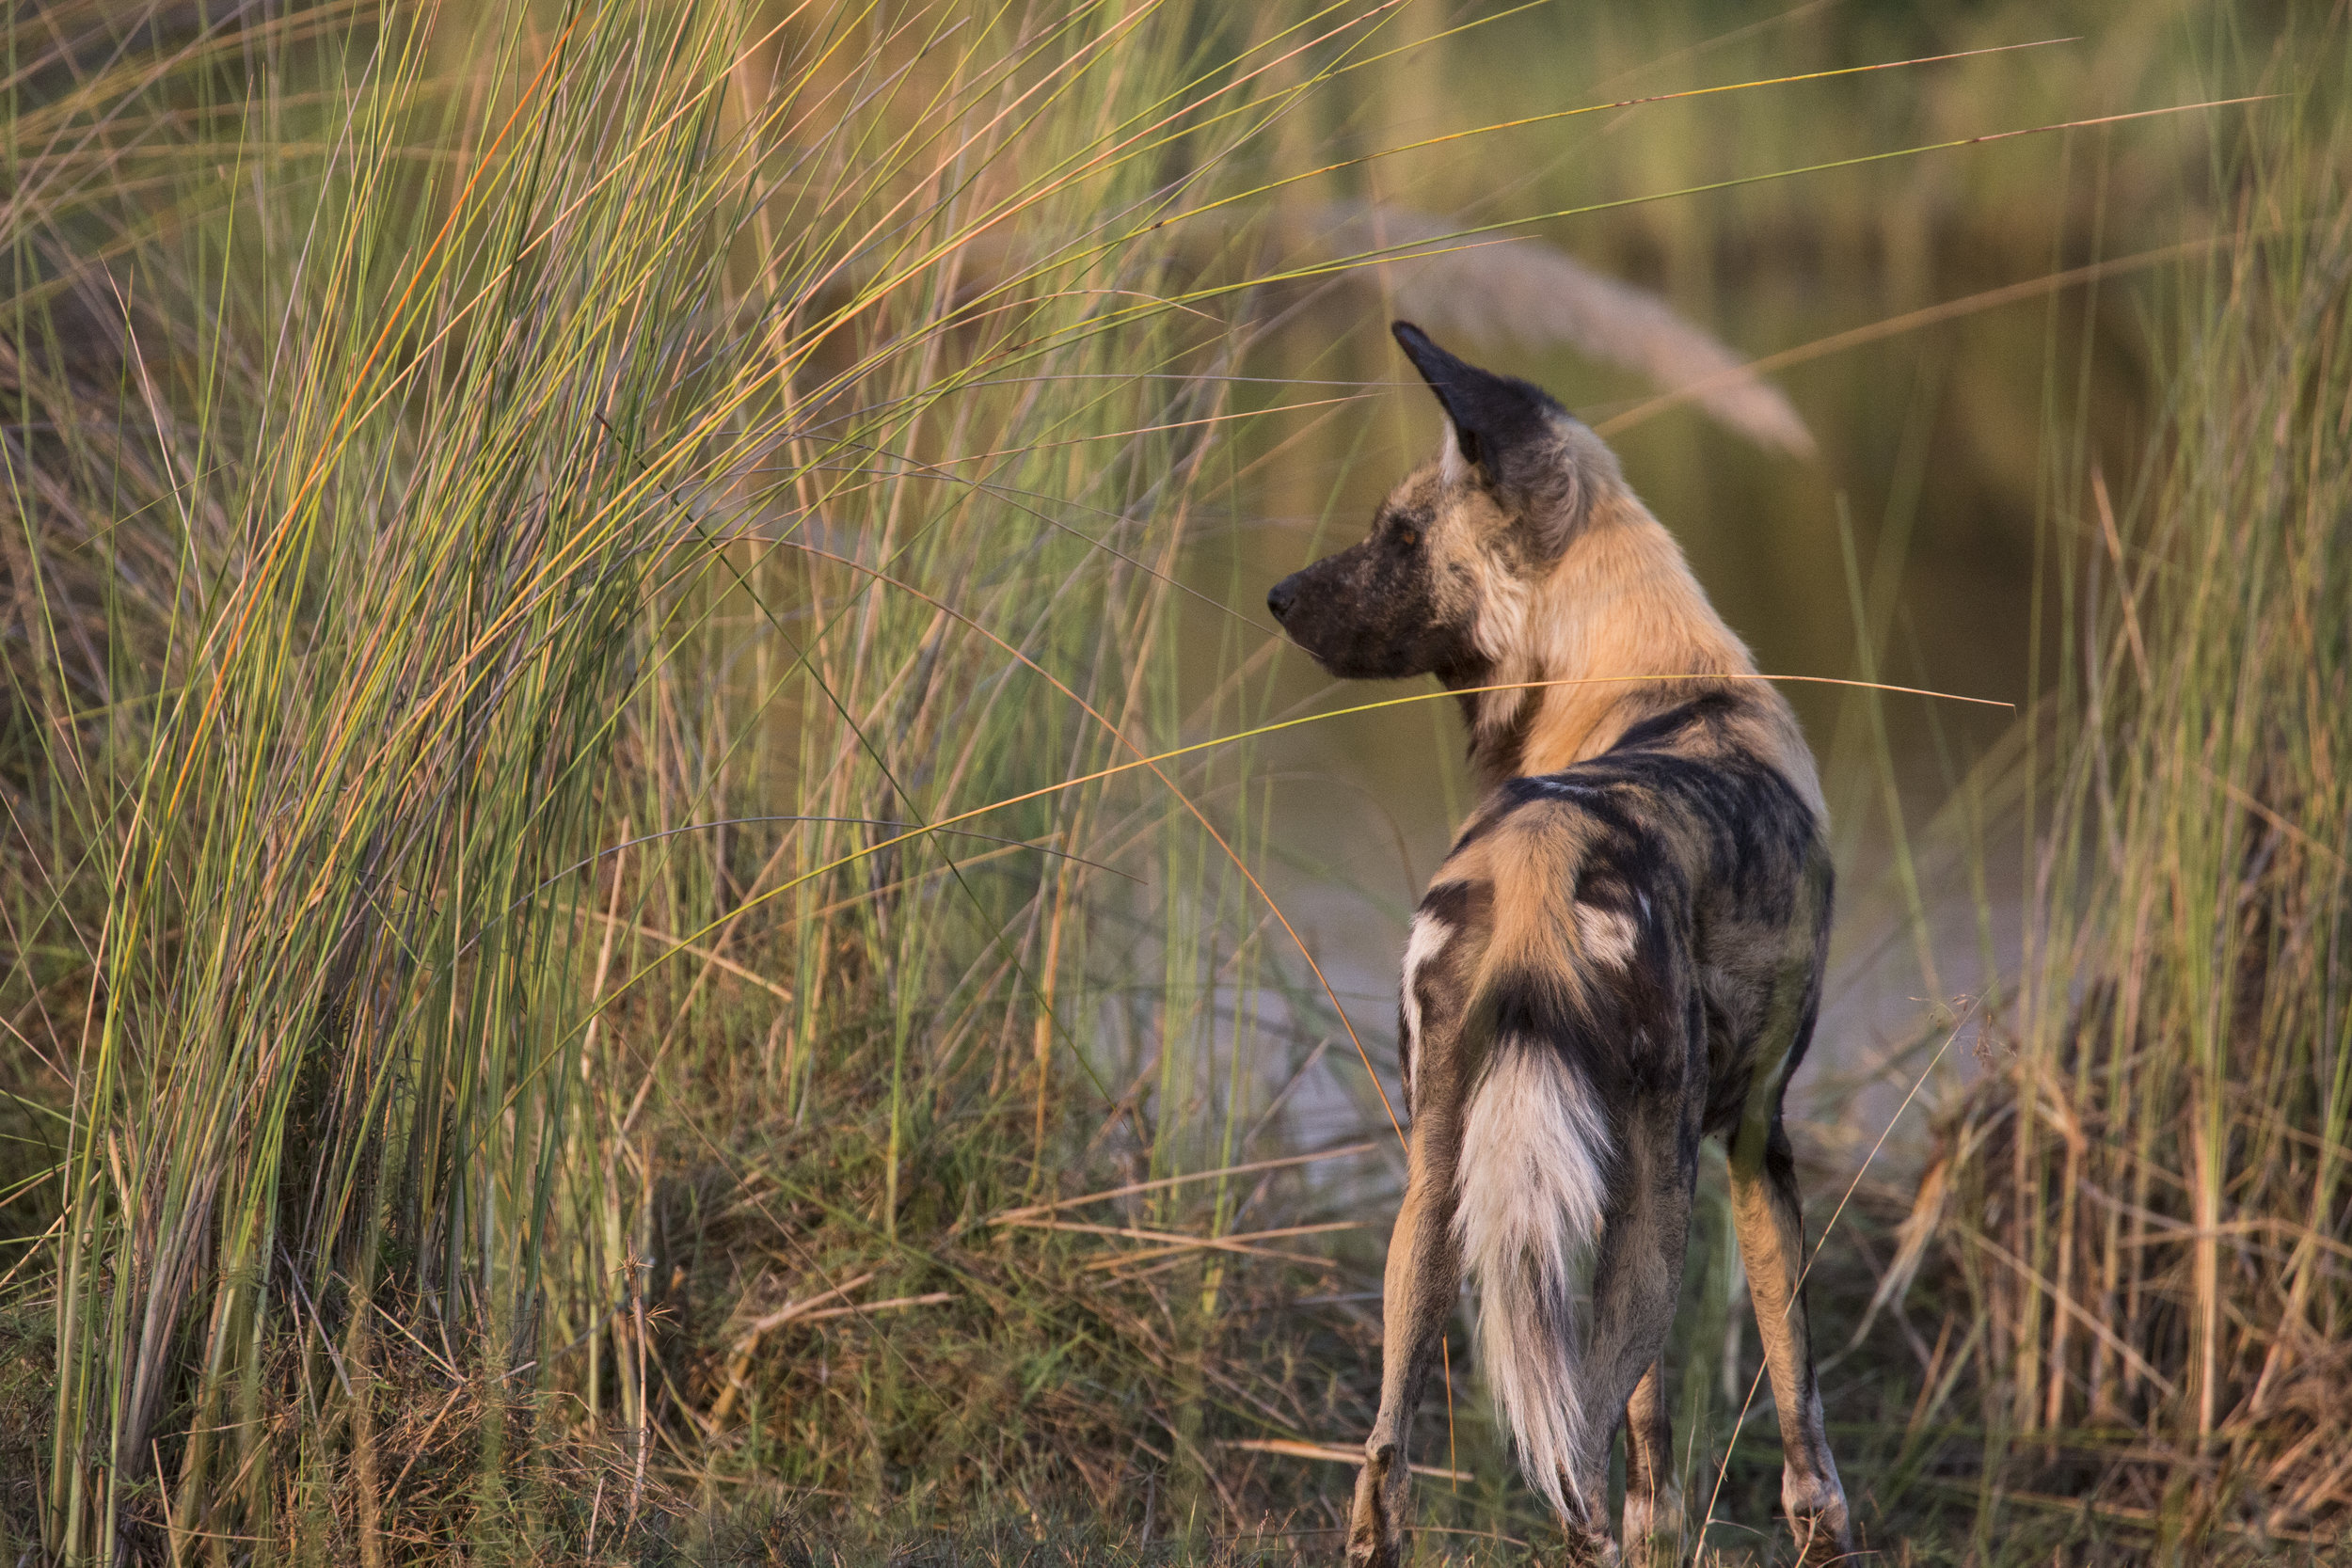 dubaexplorerscamp_wild_dogwater_vanessastephens.jpg